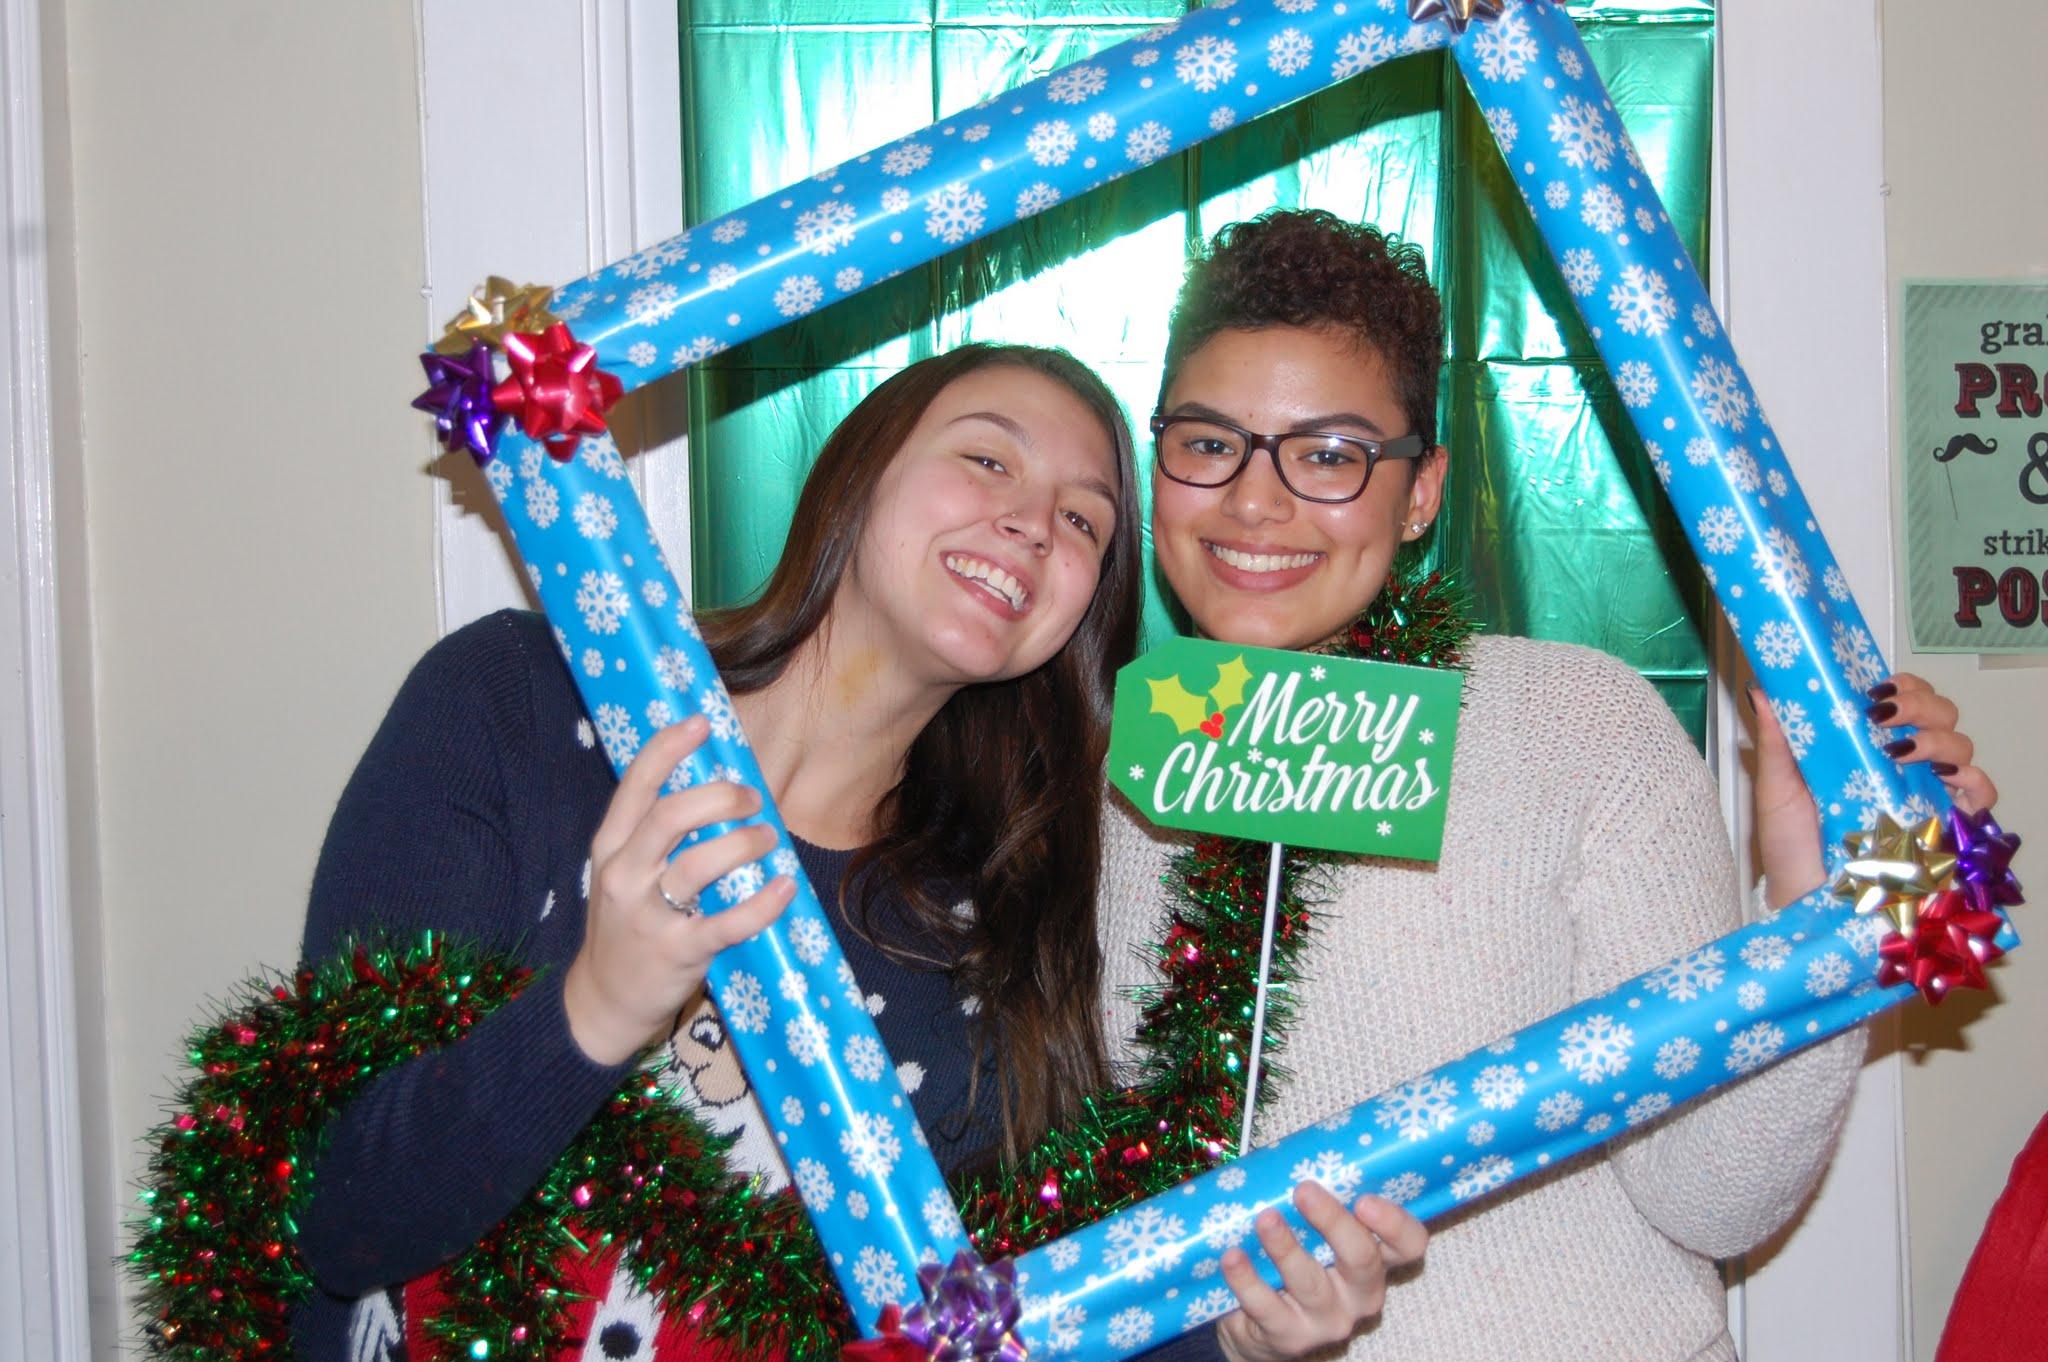 Celebrating the holidays at TLC